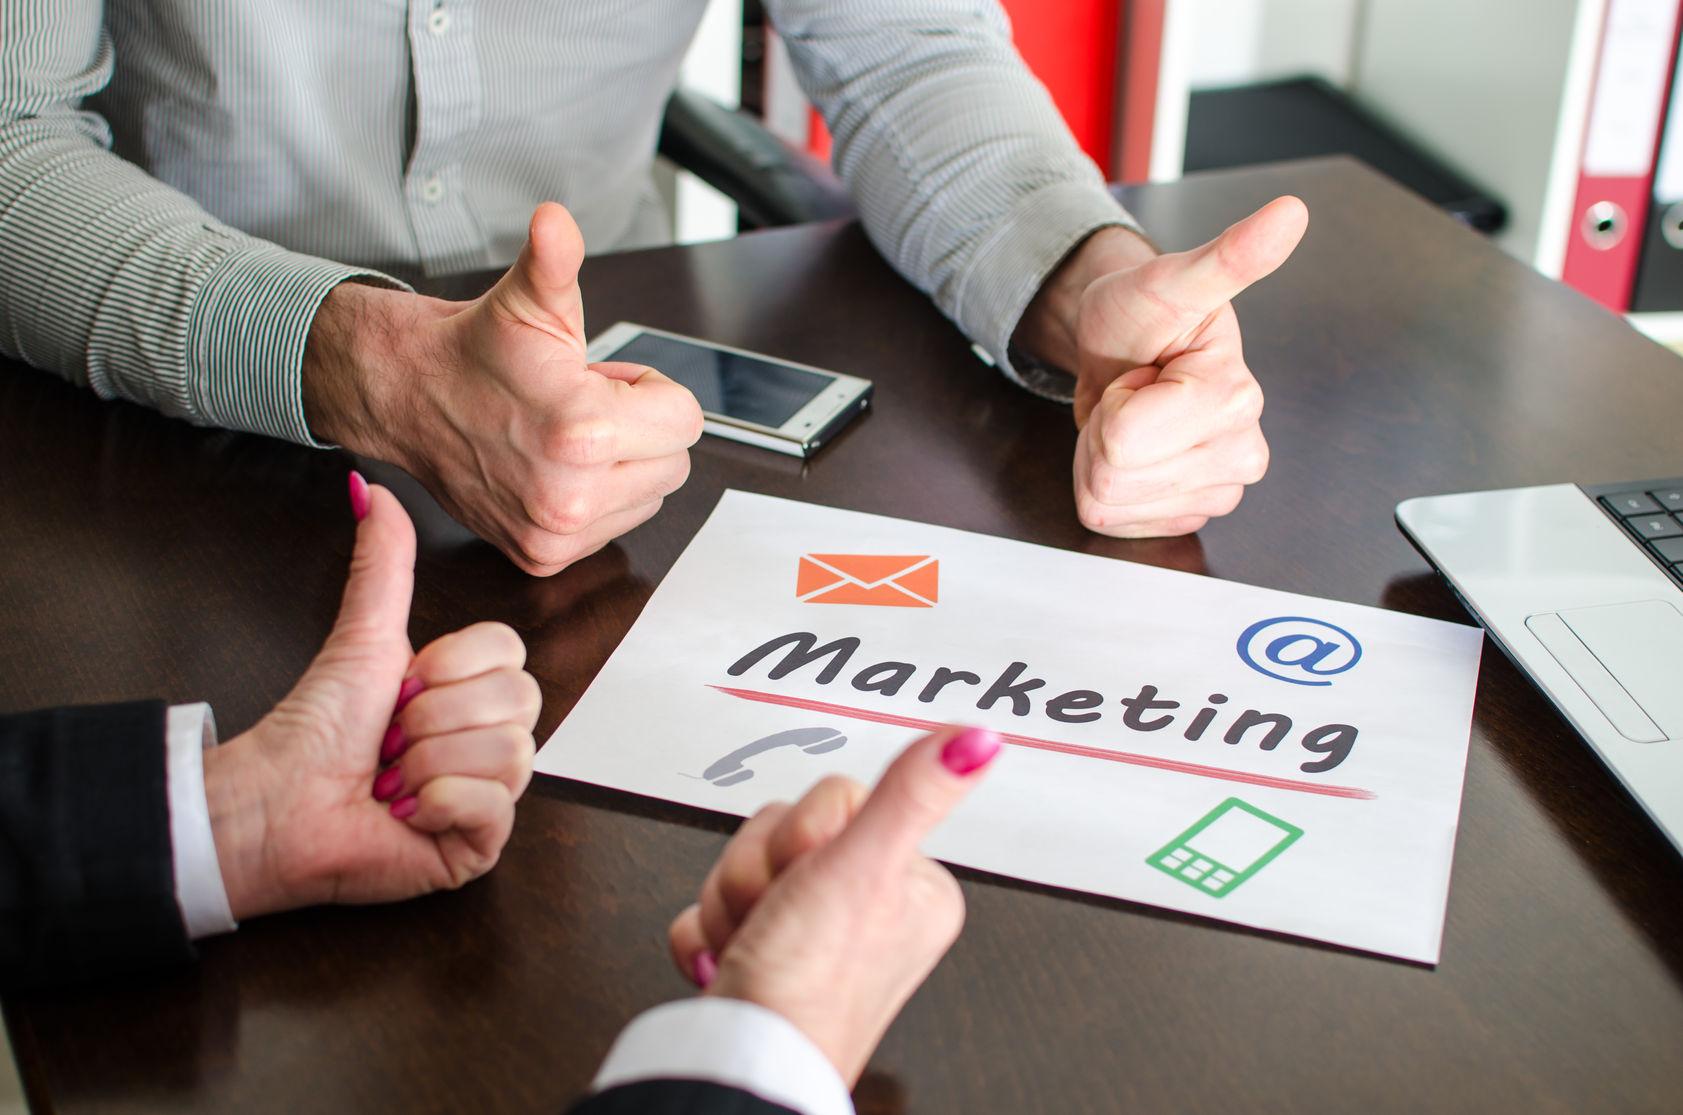 marketing-online-equipo-interno-externo